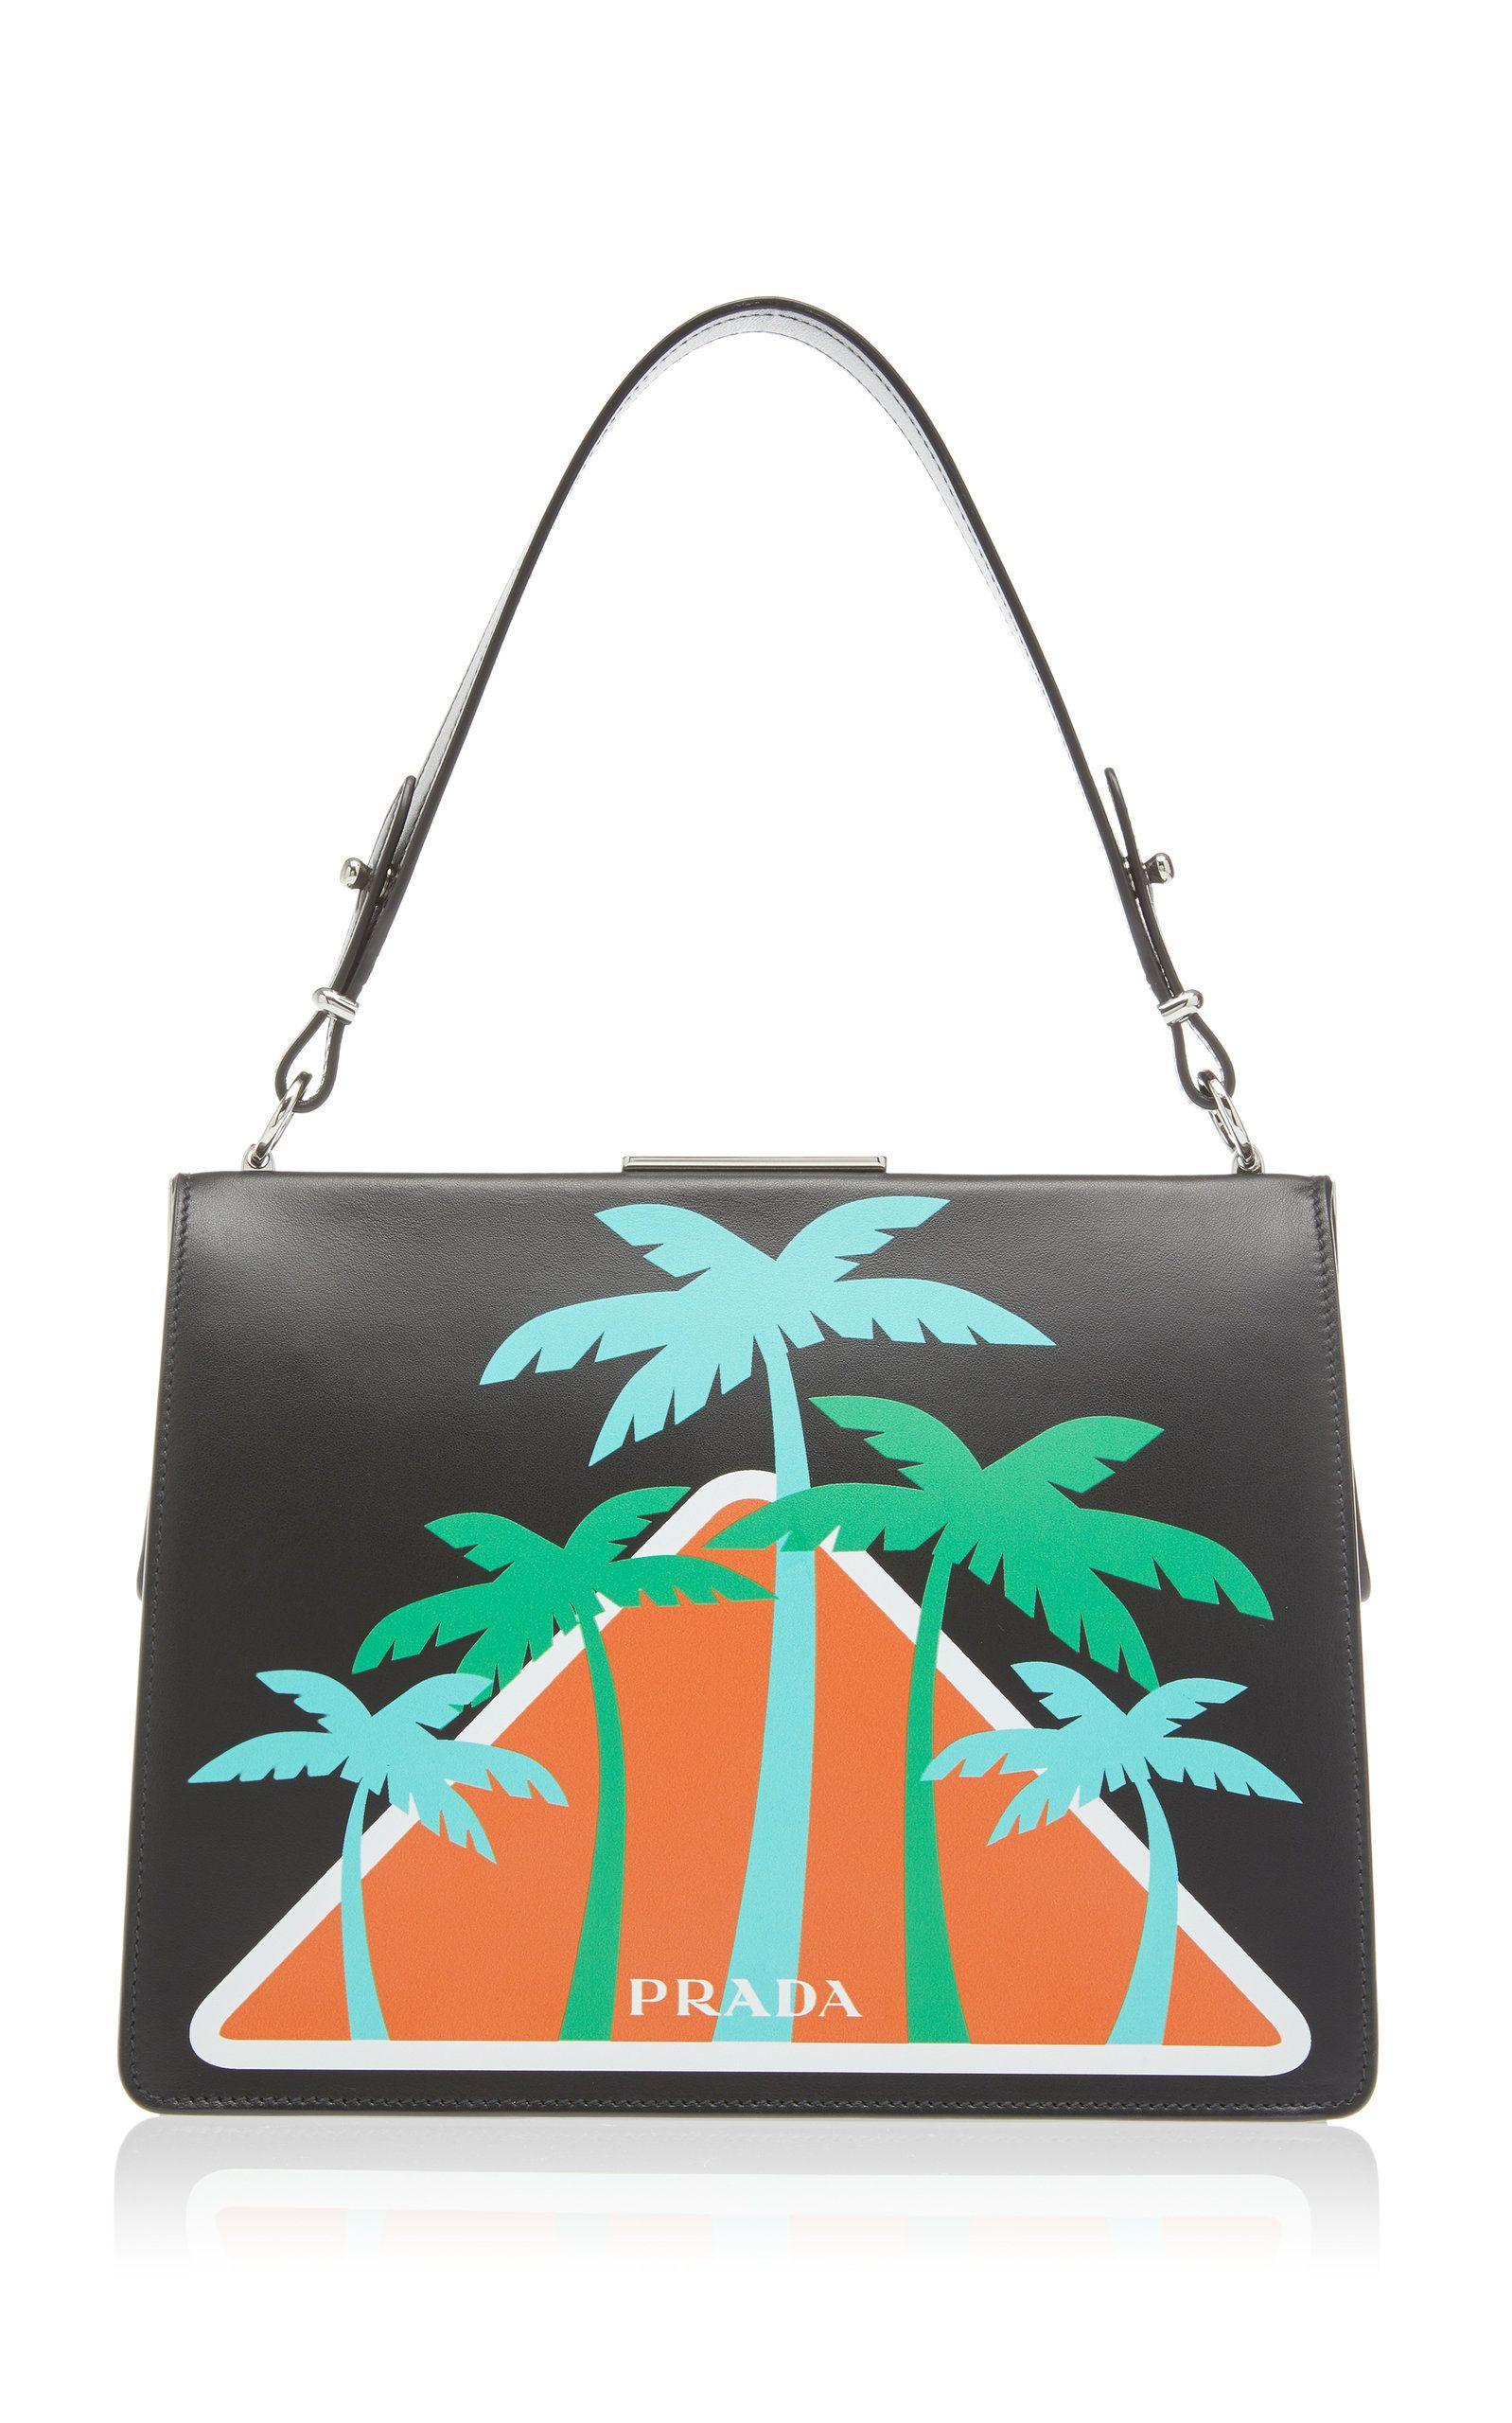 280dec5d5b2c City Calf Top Handle with Palm Trees | bizarre bags | Prada bag ...